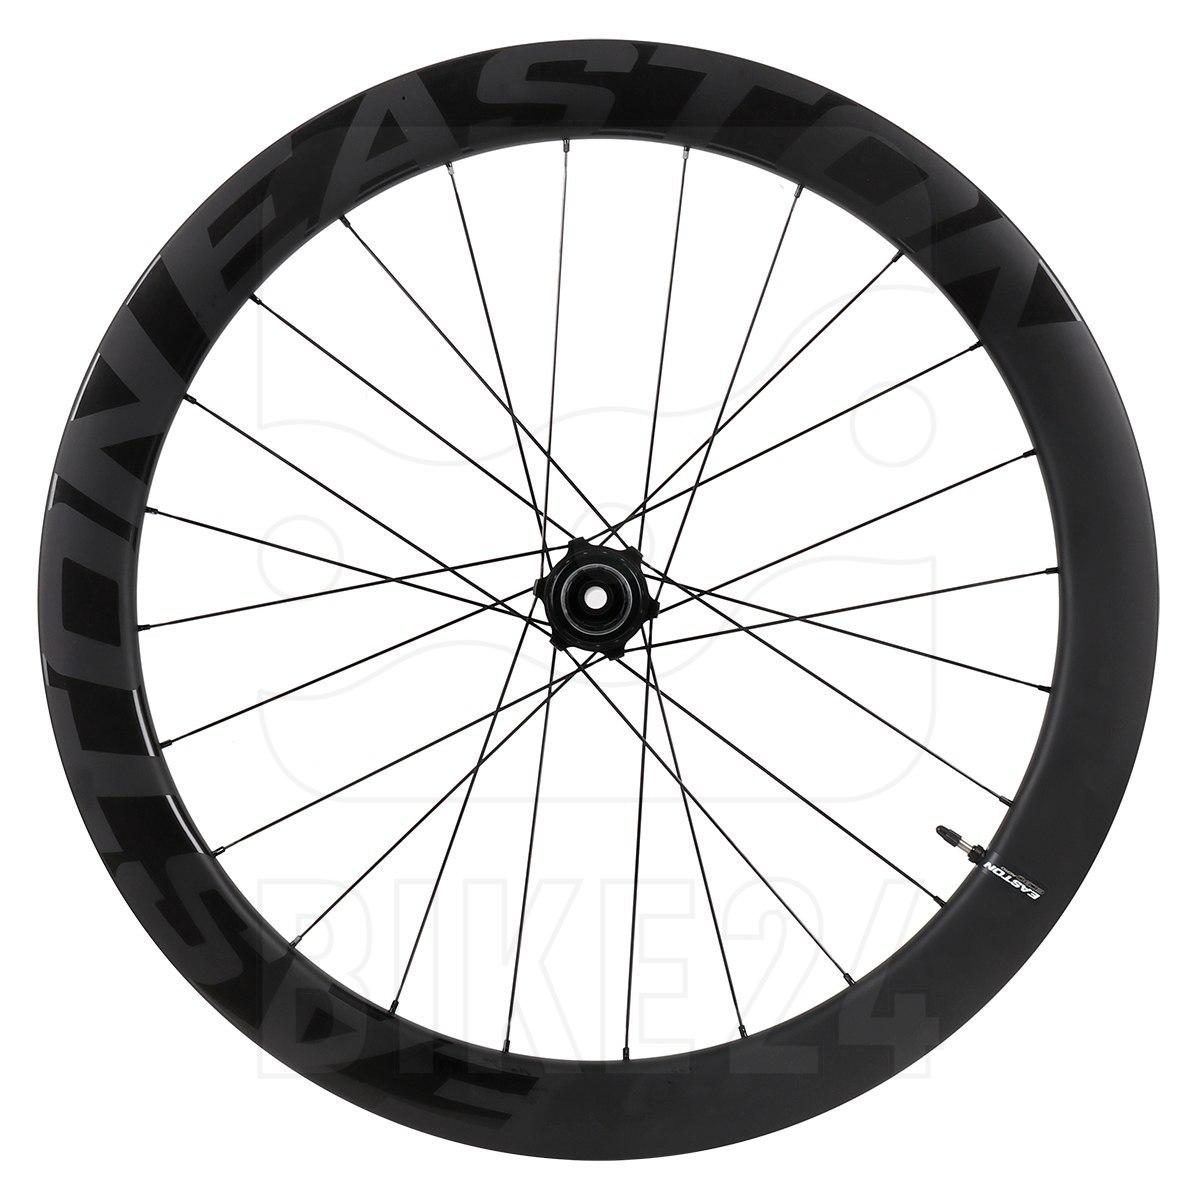 Easton EC90 Aero 55 Carbon Disc Rear Wheel for Clincher - Centerlock - 12x142mm - matte carbon